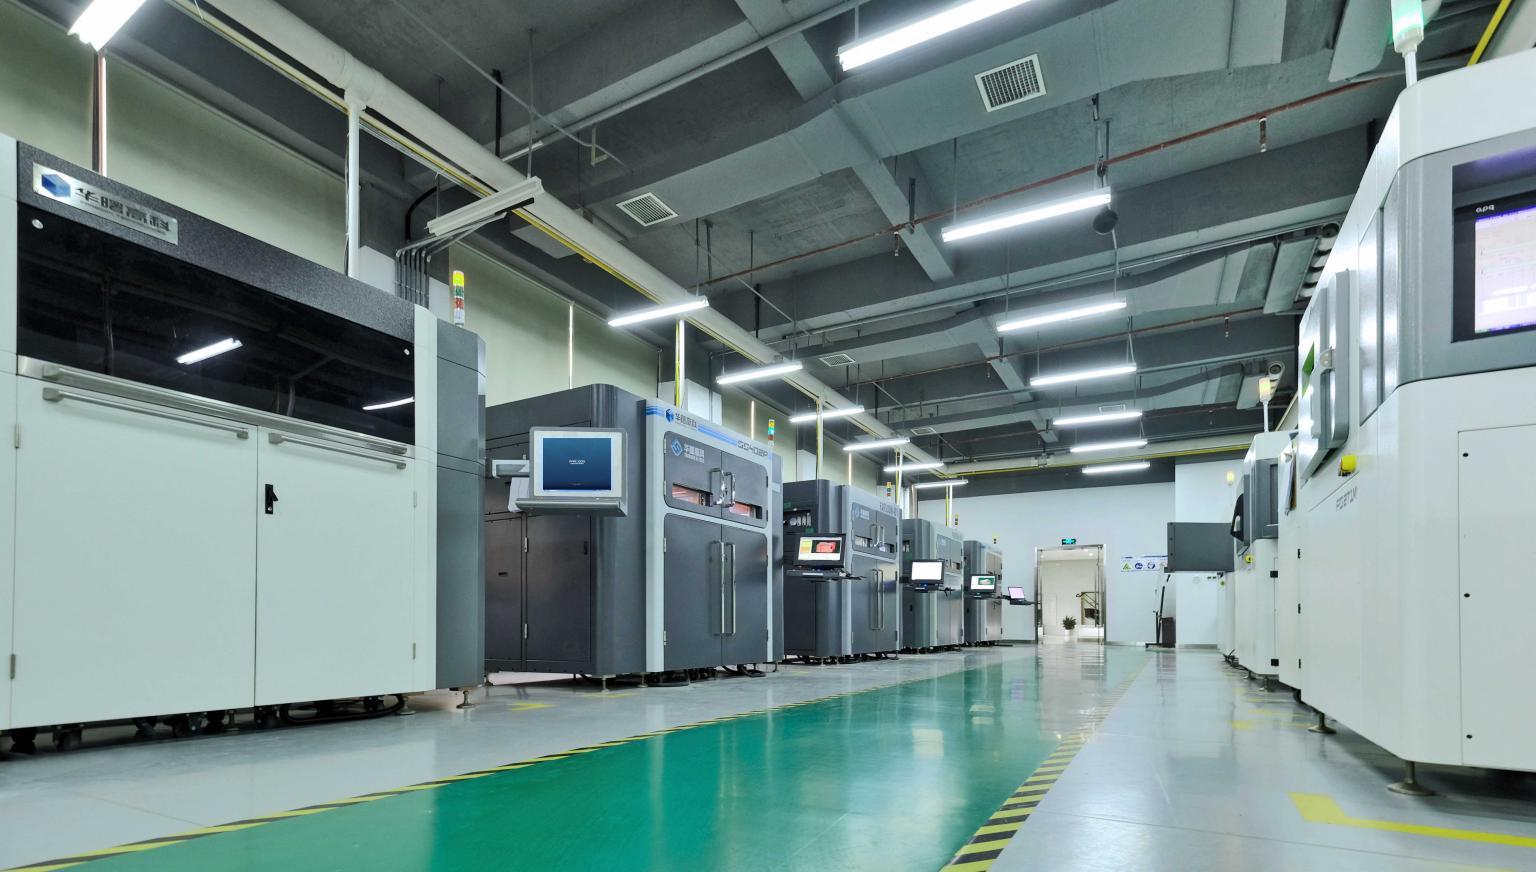 Farsoon Headquarter Application Center, Changsha, China